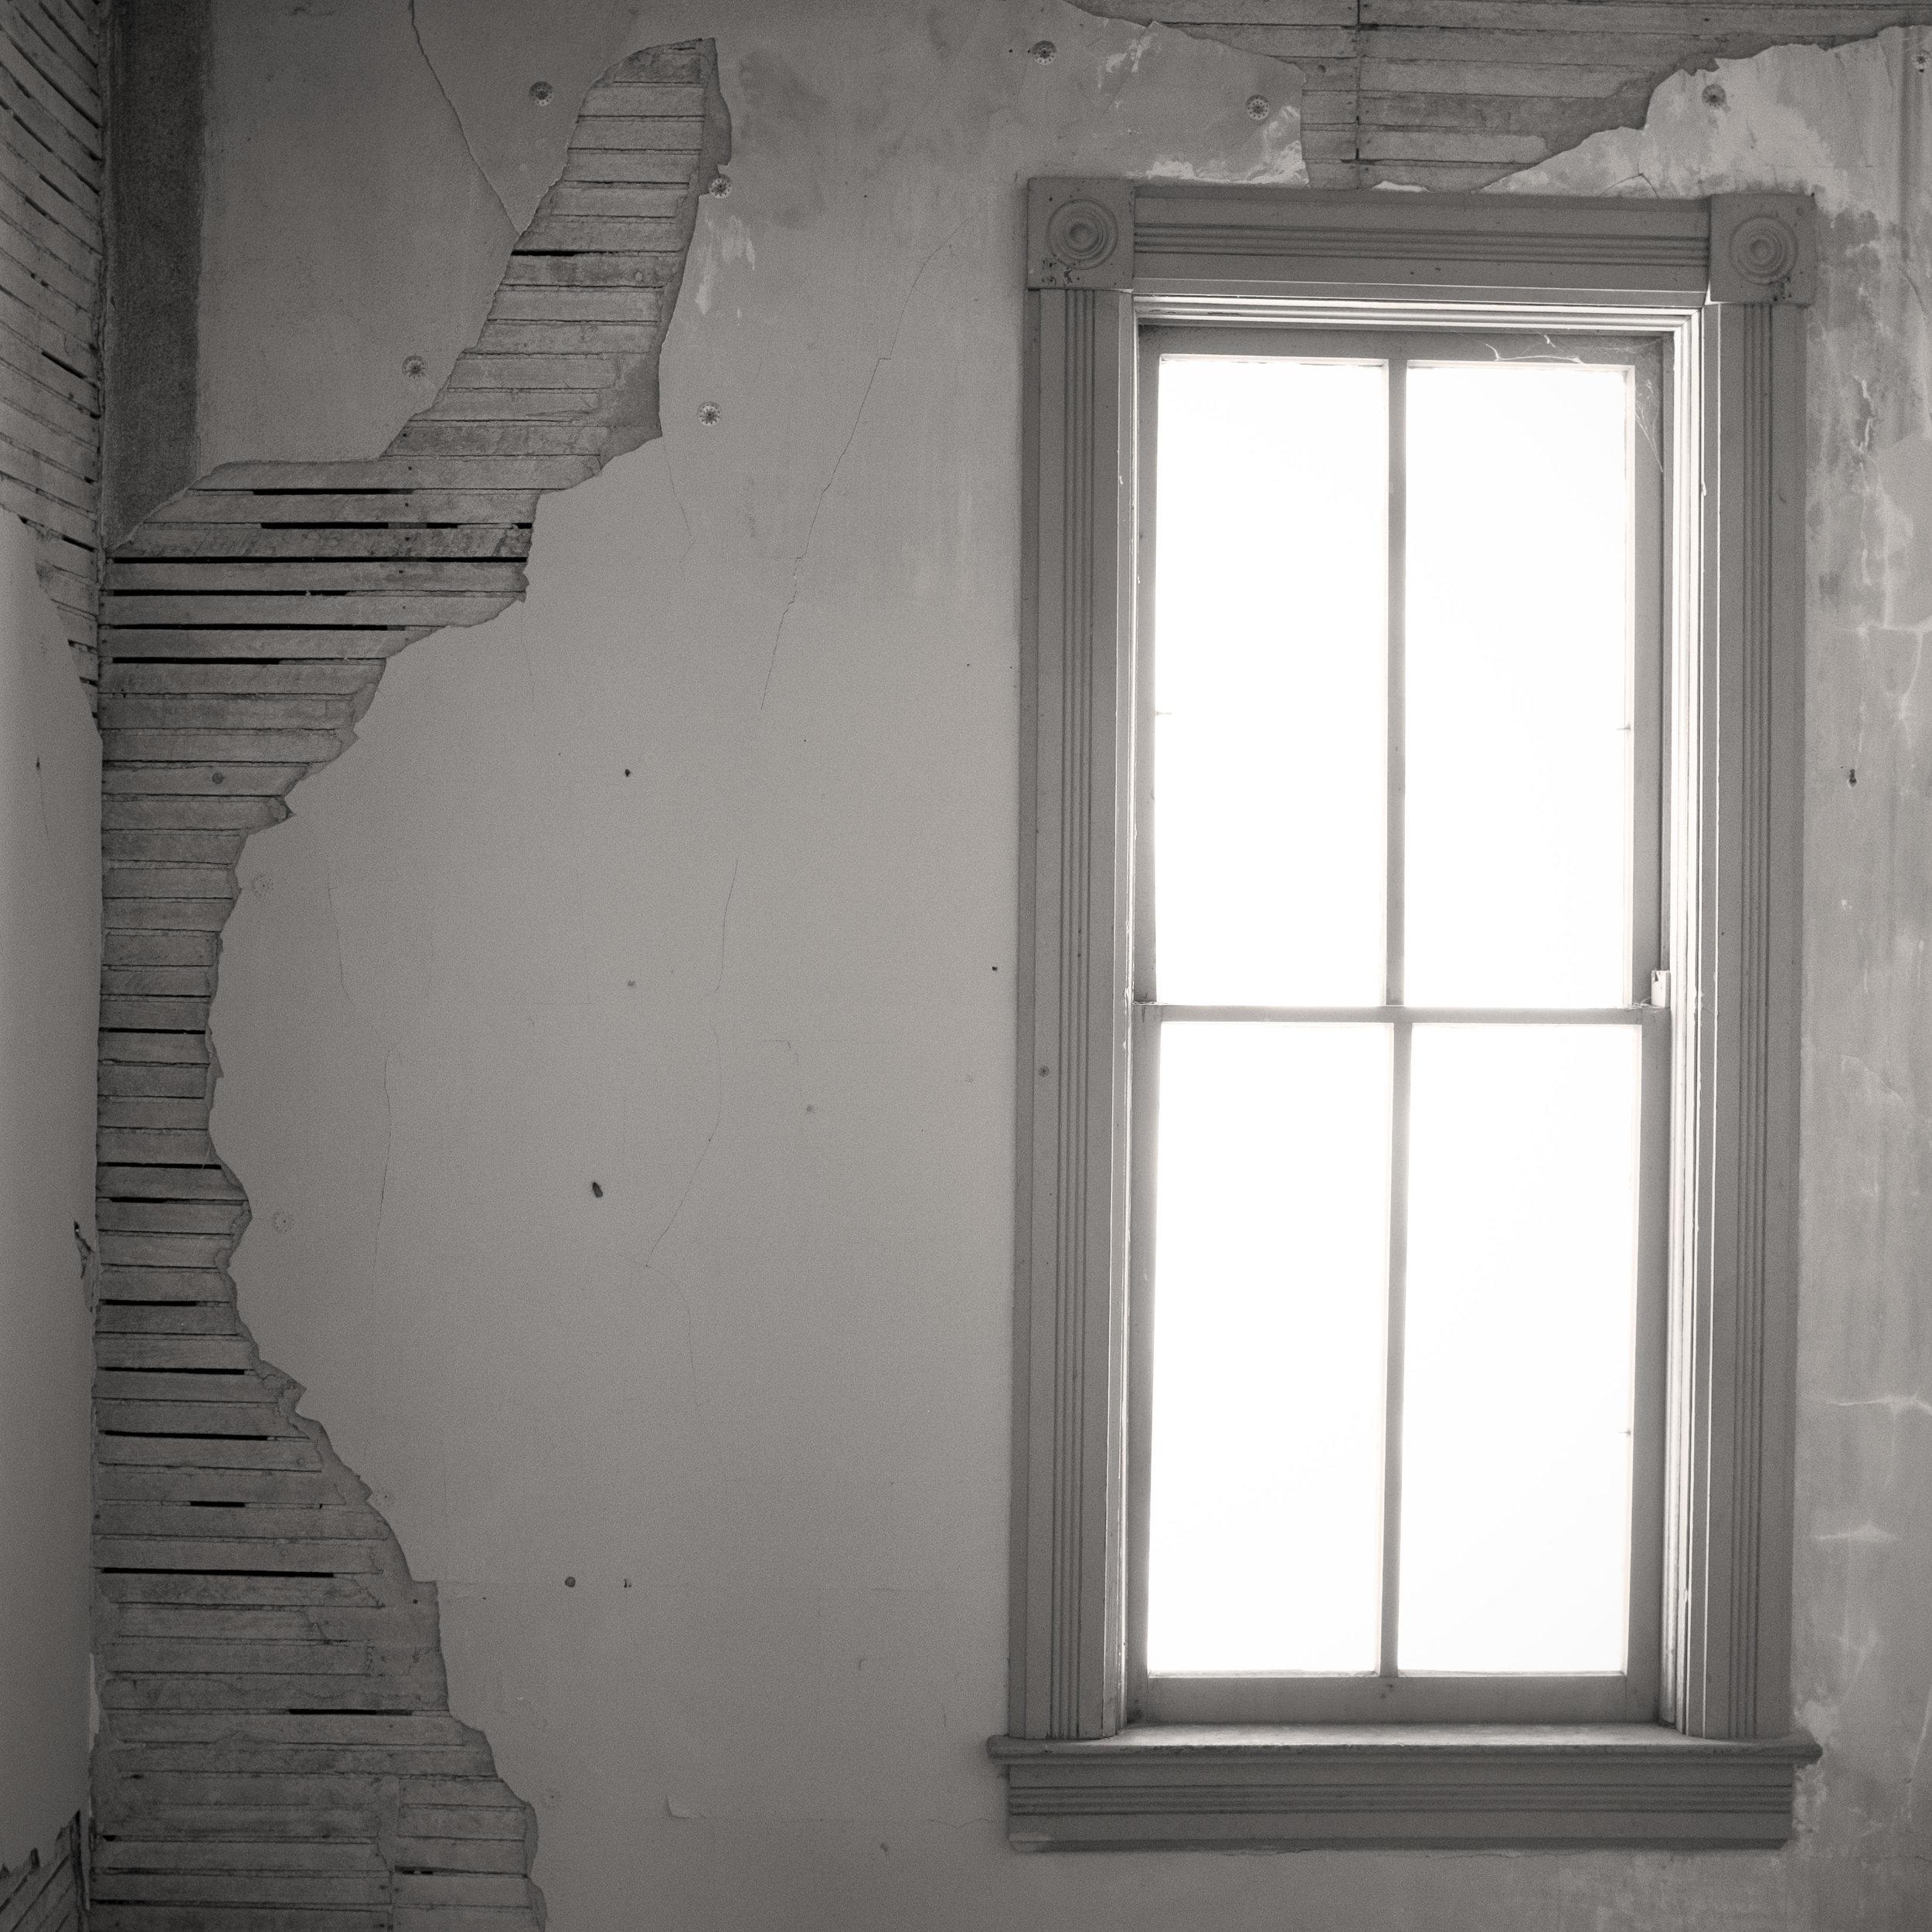 Bannack_window_01.jpg